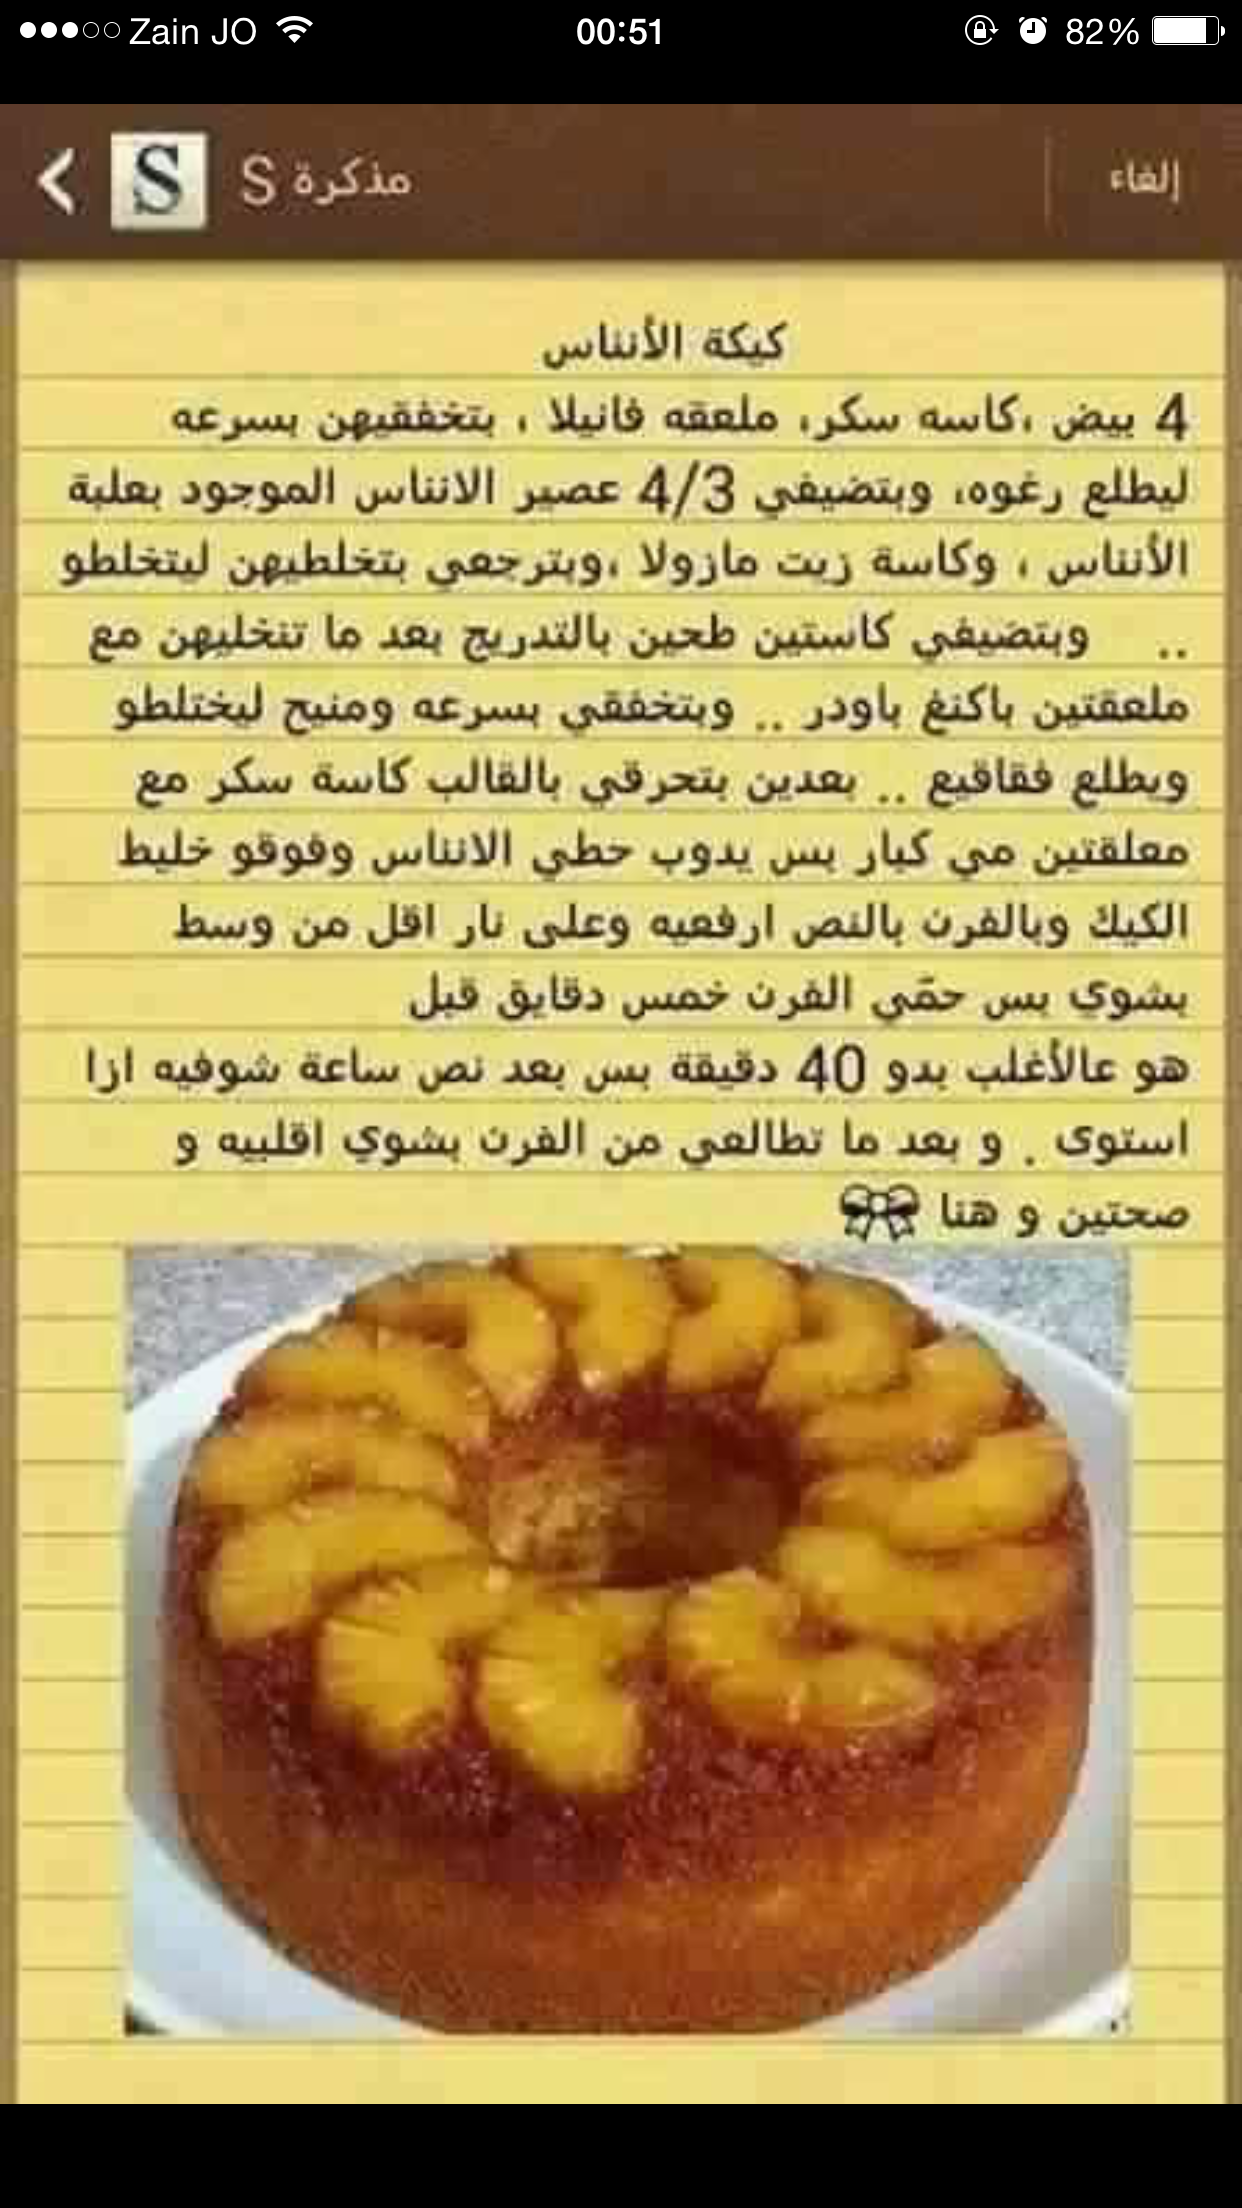 Pin By Munira Ali On Desserts Food Garnishes Diy Food Recipes Arabic Sweets Recipes